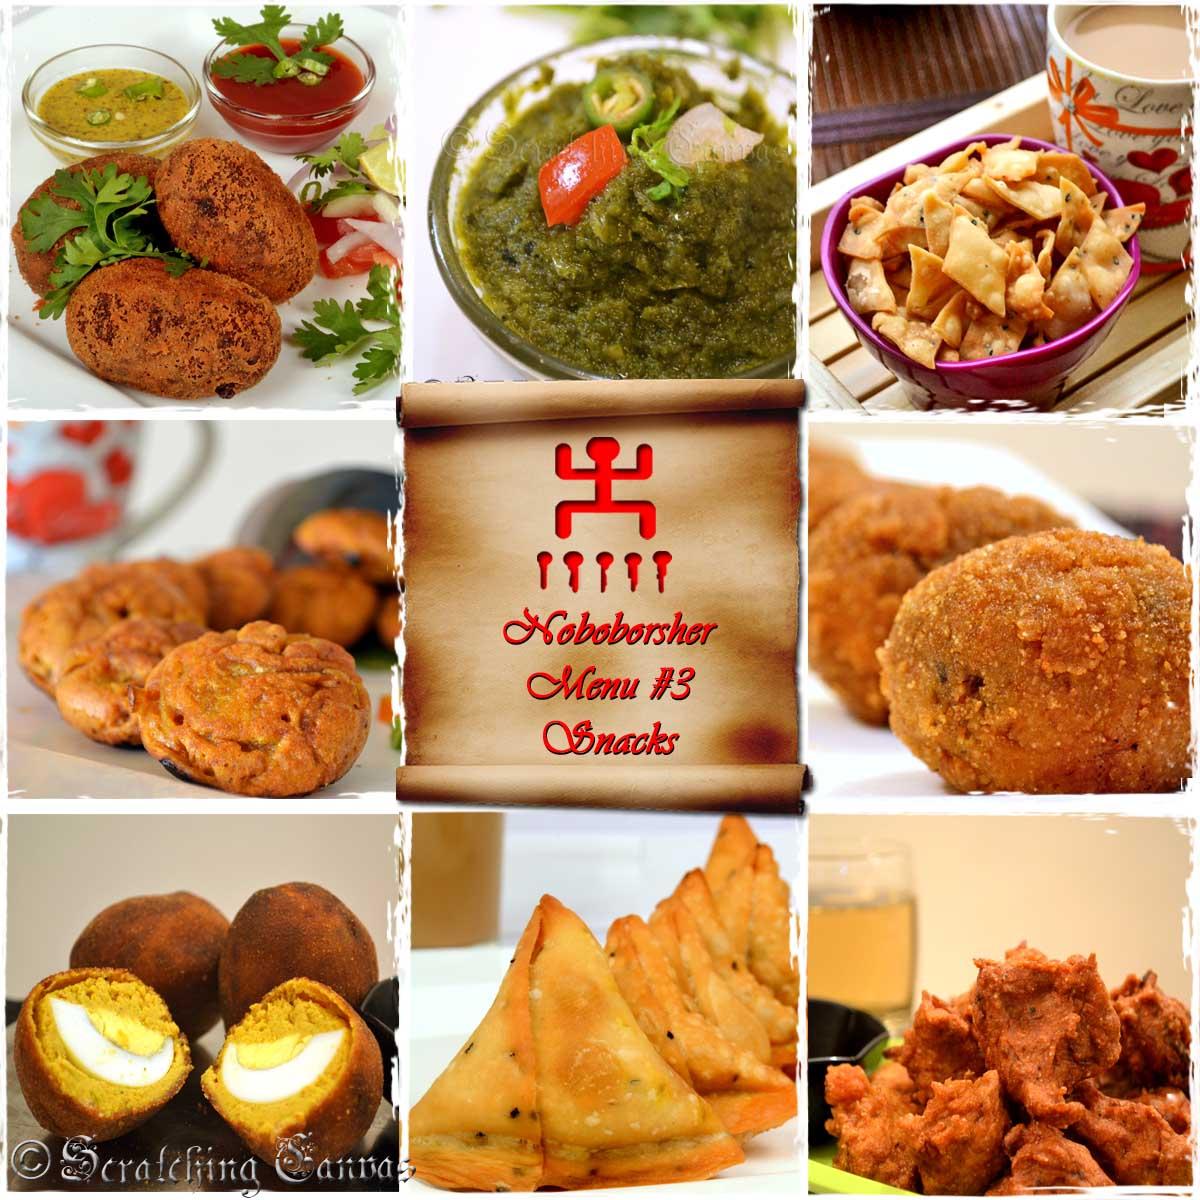 Poila baisakh nobo borsho bengali new year special menu roundup traditional bengali snacks forumfinder Images